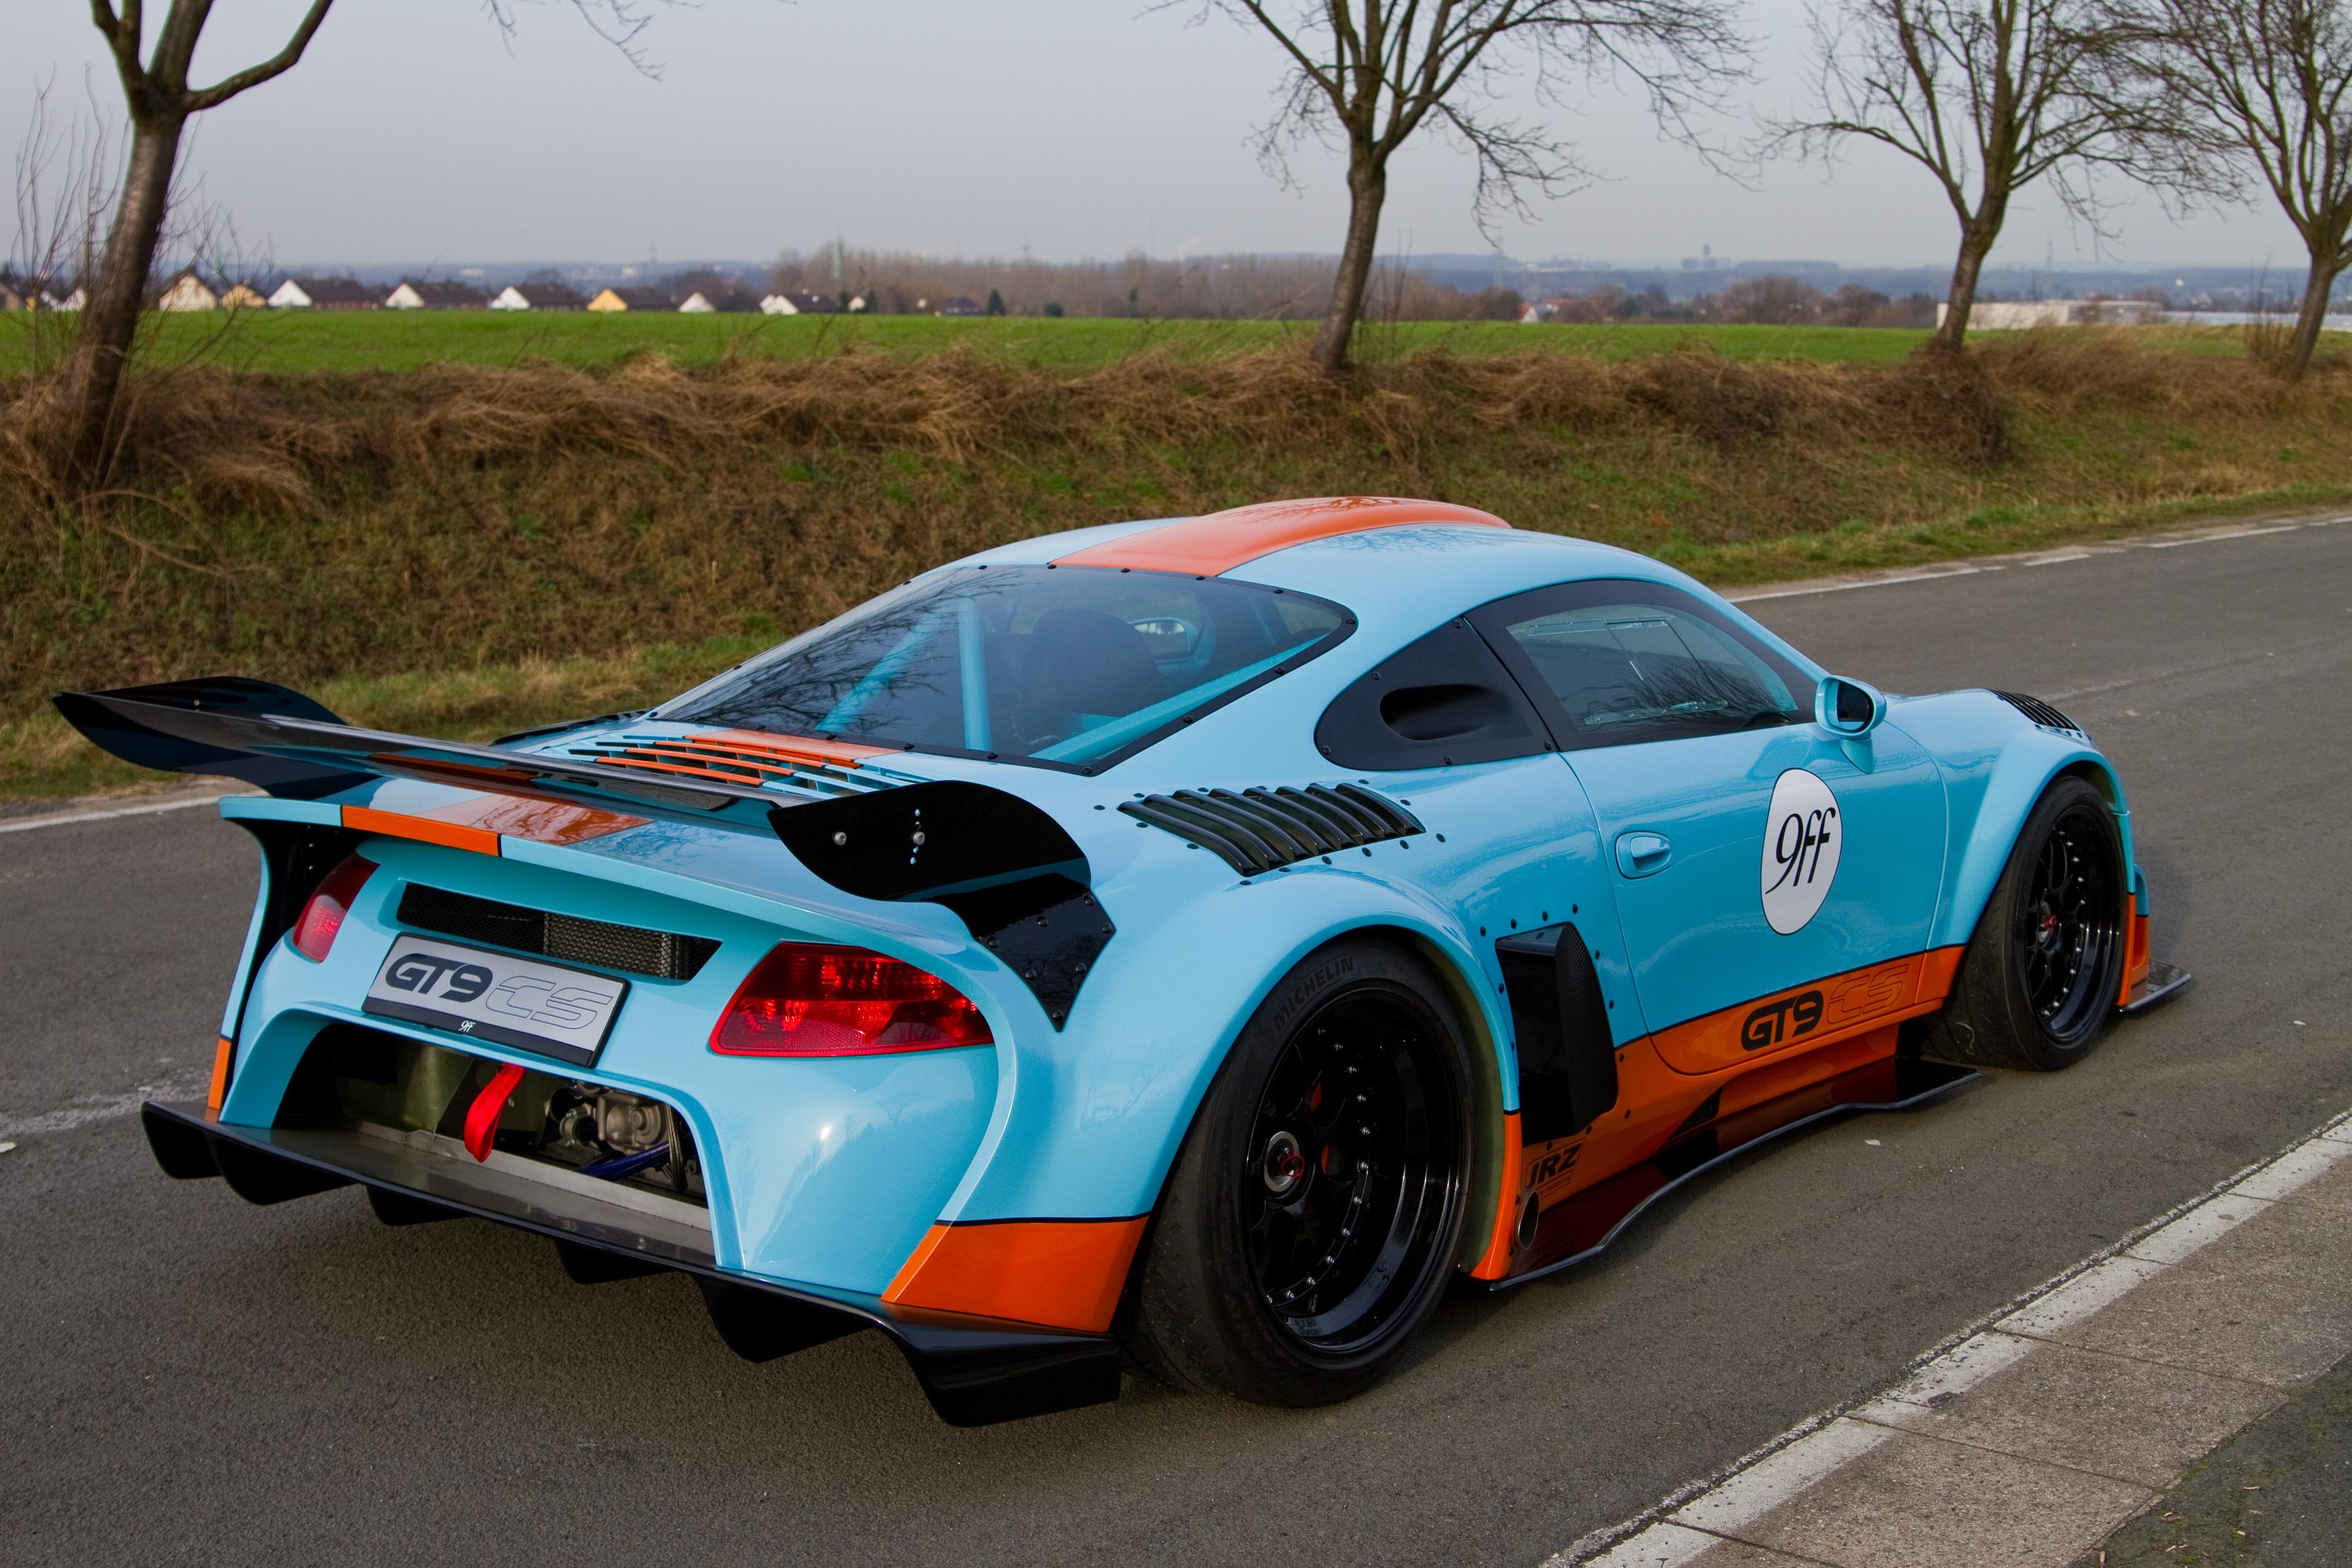 Wallpaper Sports Car Coupe Performance Car 2012 9ff Gt9 Cs